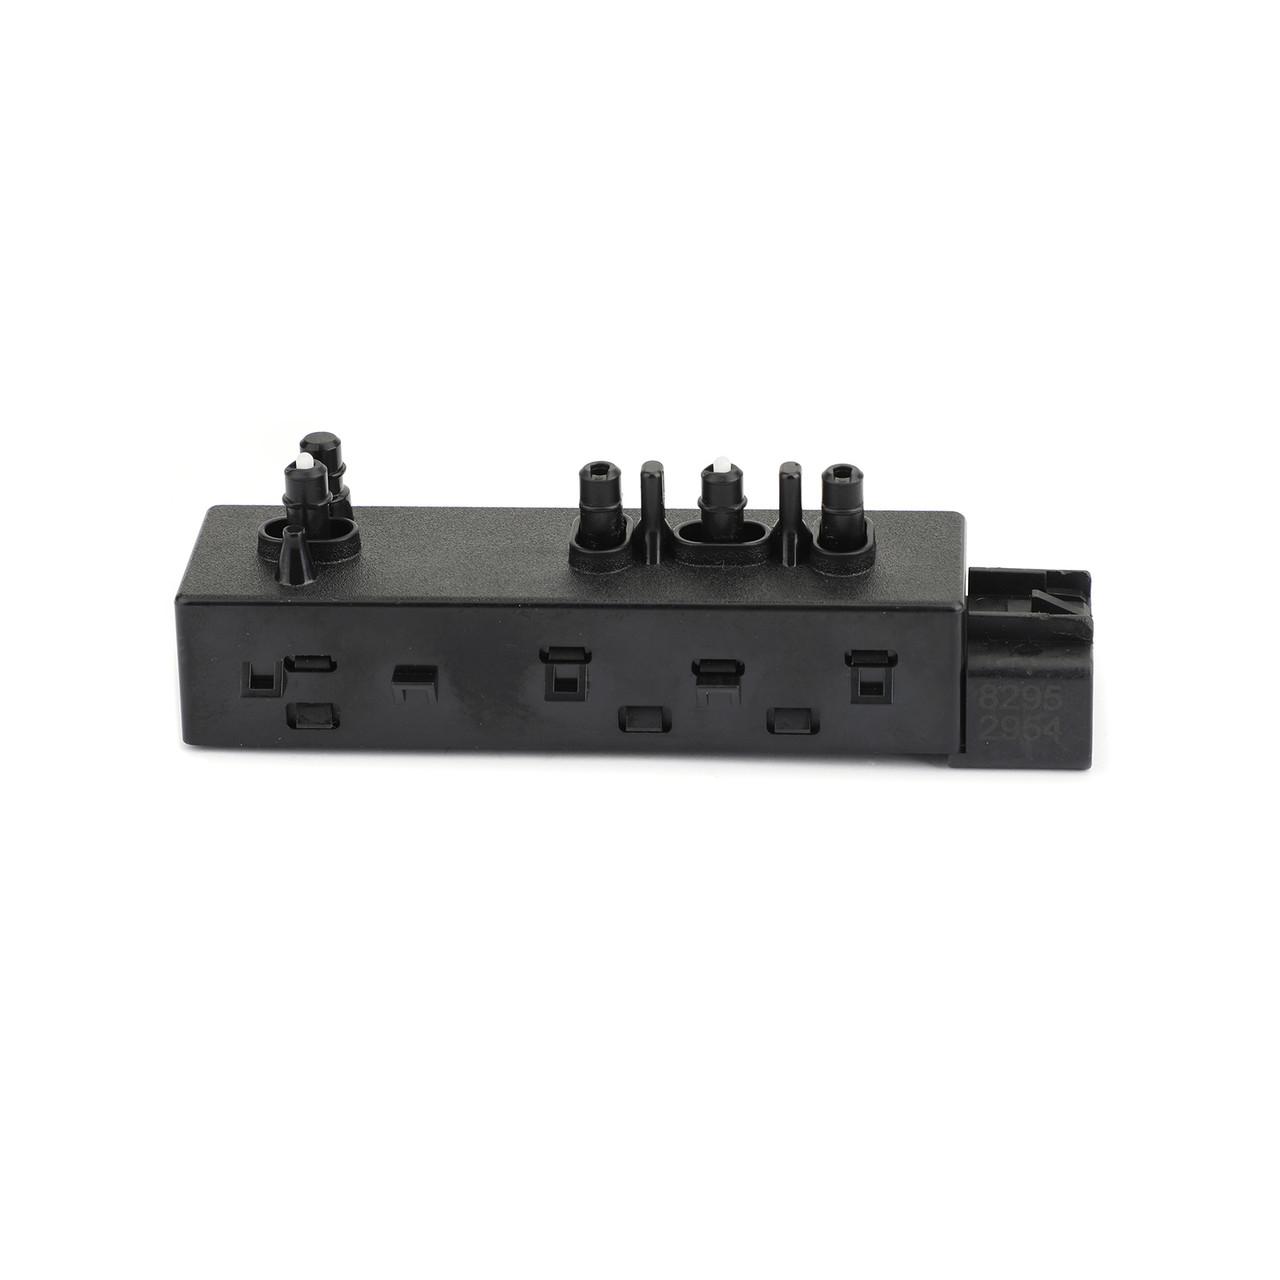 Power Seat Switch Left Driver Side 25974714 Fit For Chevrolet Camaro 10-15 Equinox Malibu GMC Terrain 10-18 Limited 16 Cruze 16-18 Black